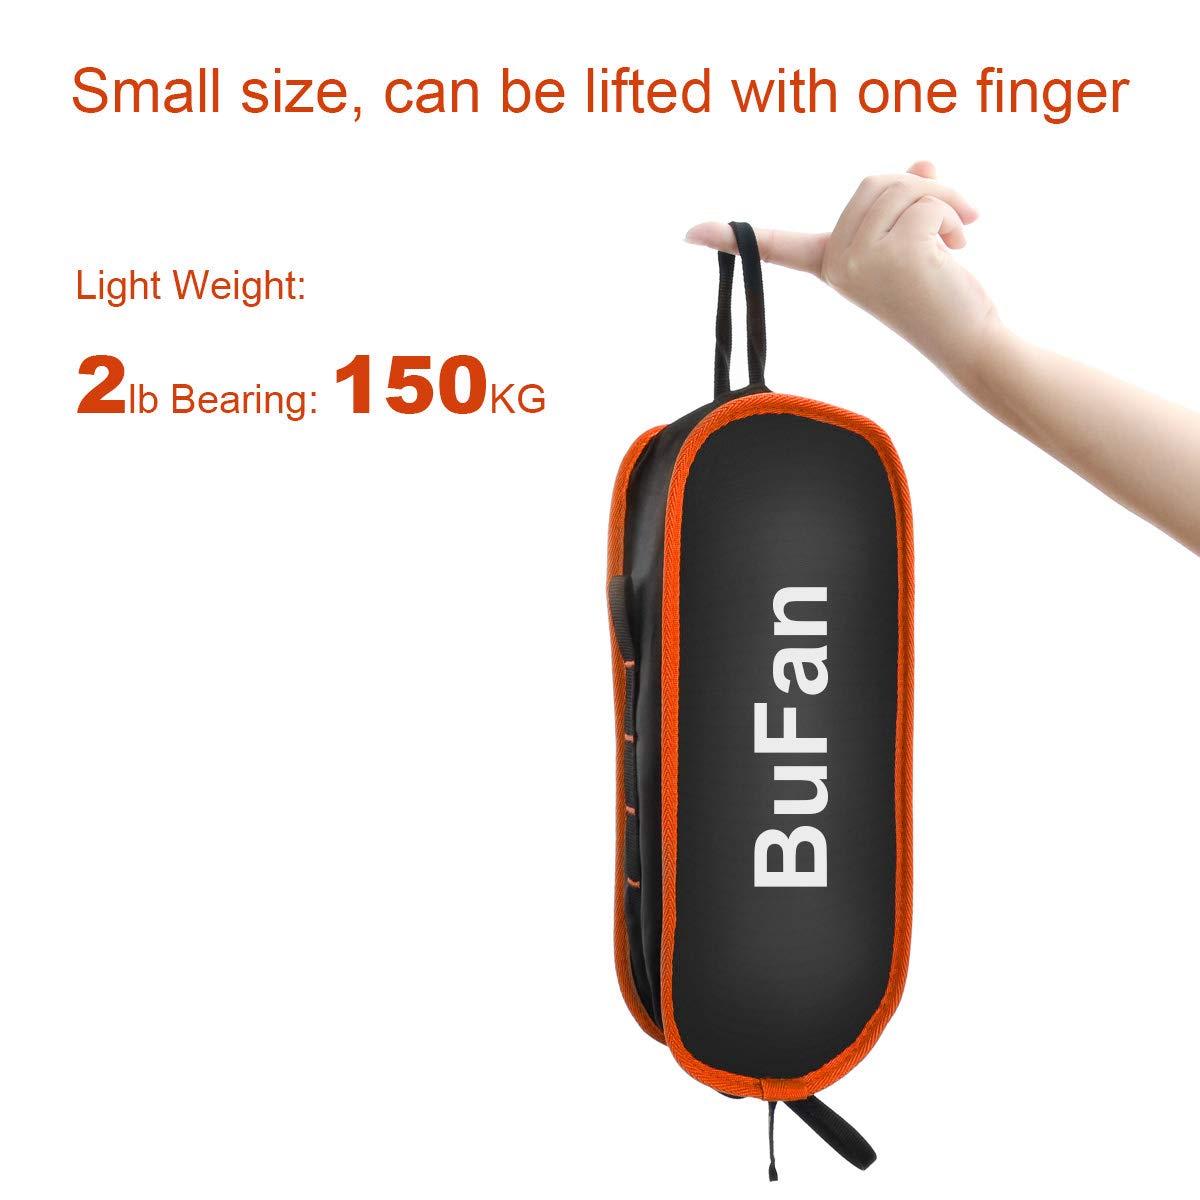 Portá Con Ideal Plegable Silla Camping Y Bolsa De Til Bufan 43qA5LRj